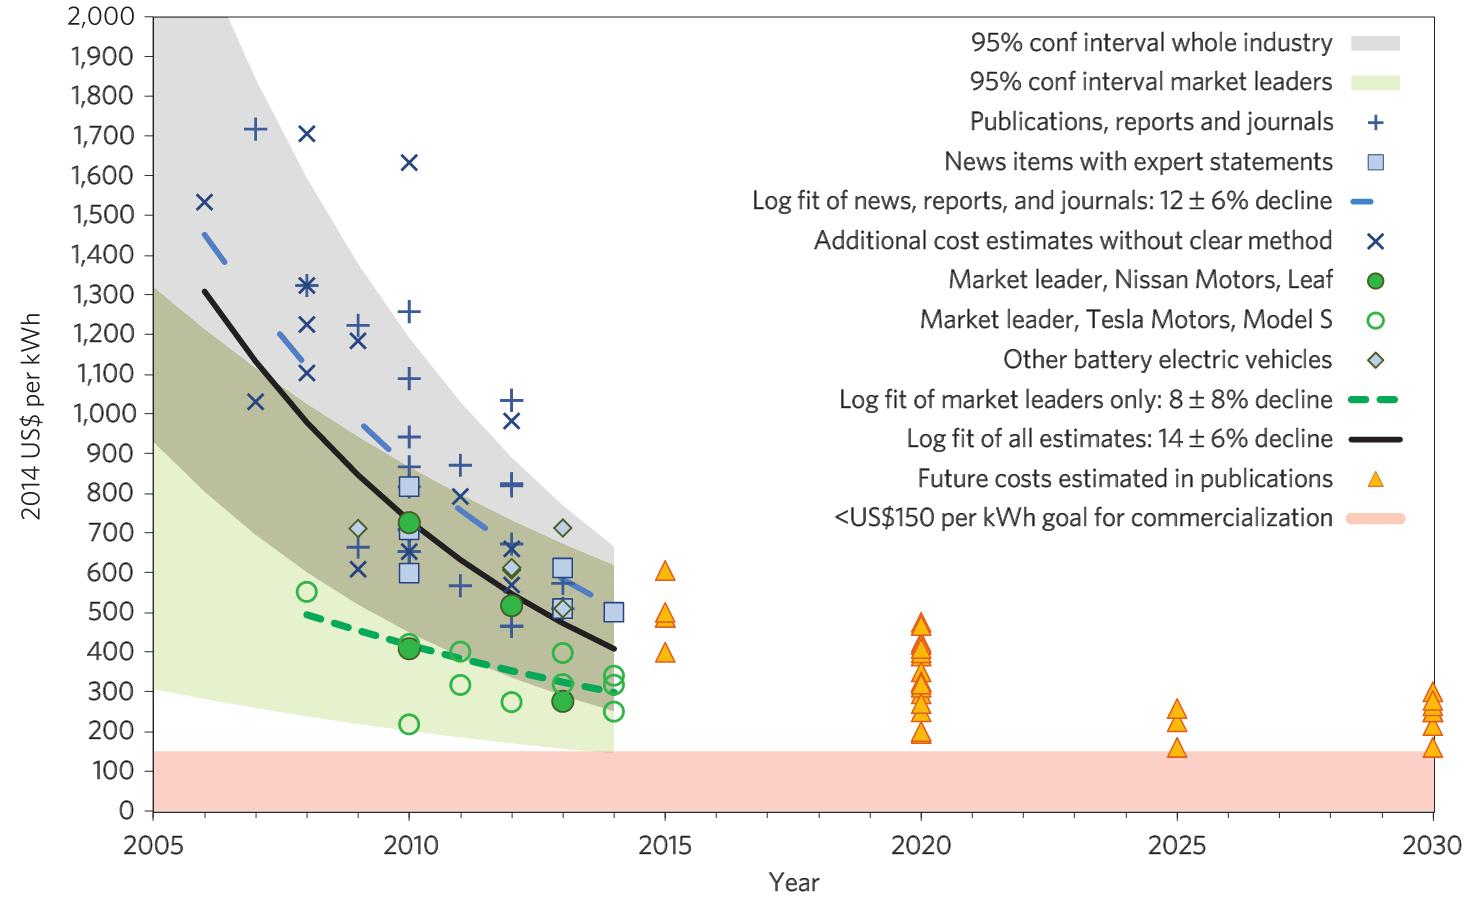 Gráfica de evolución precios de baterías eléctricos hasta 2020